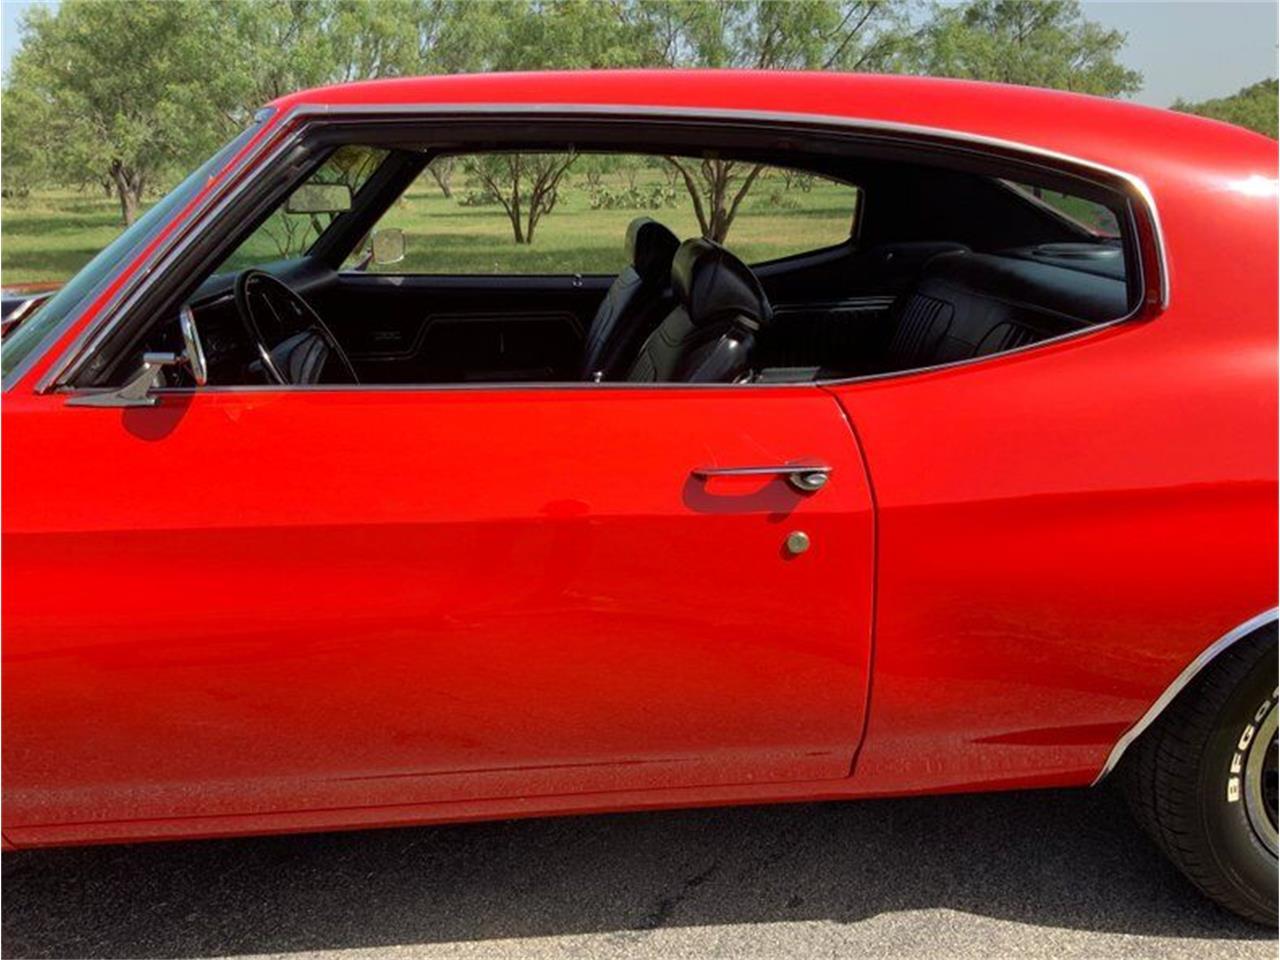 1971 Chevrolet Chevelle (CC-1365027) for sale in Fredericksburg, Texas